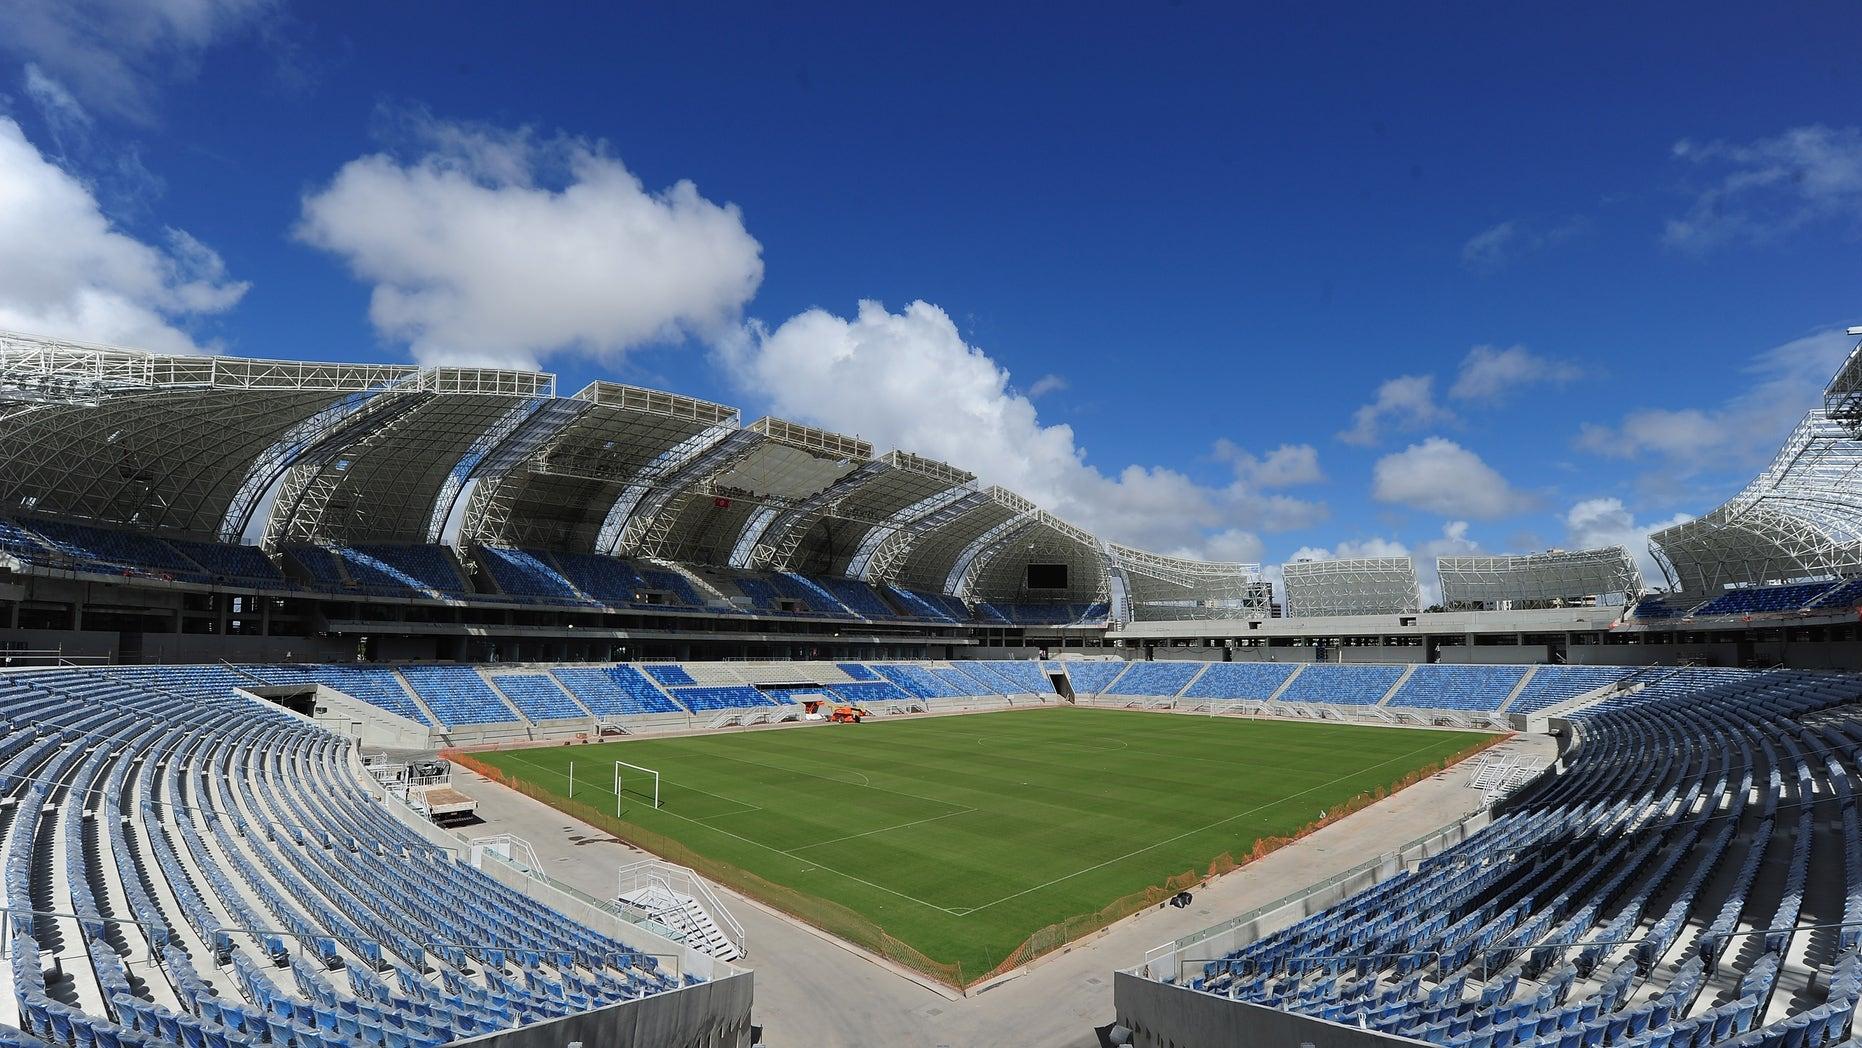 The Arena Das Dunas venue on December 8, 2013 in Natal, Brazil.